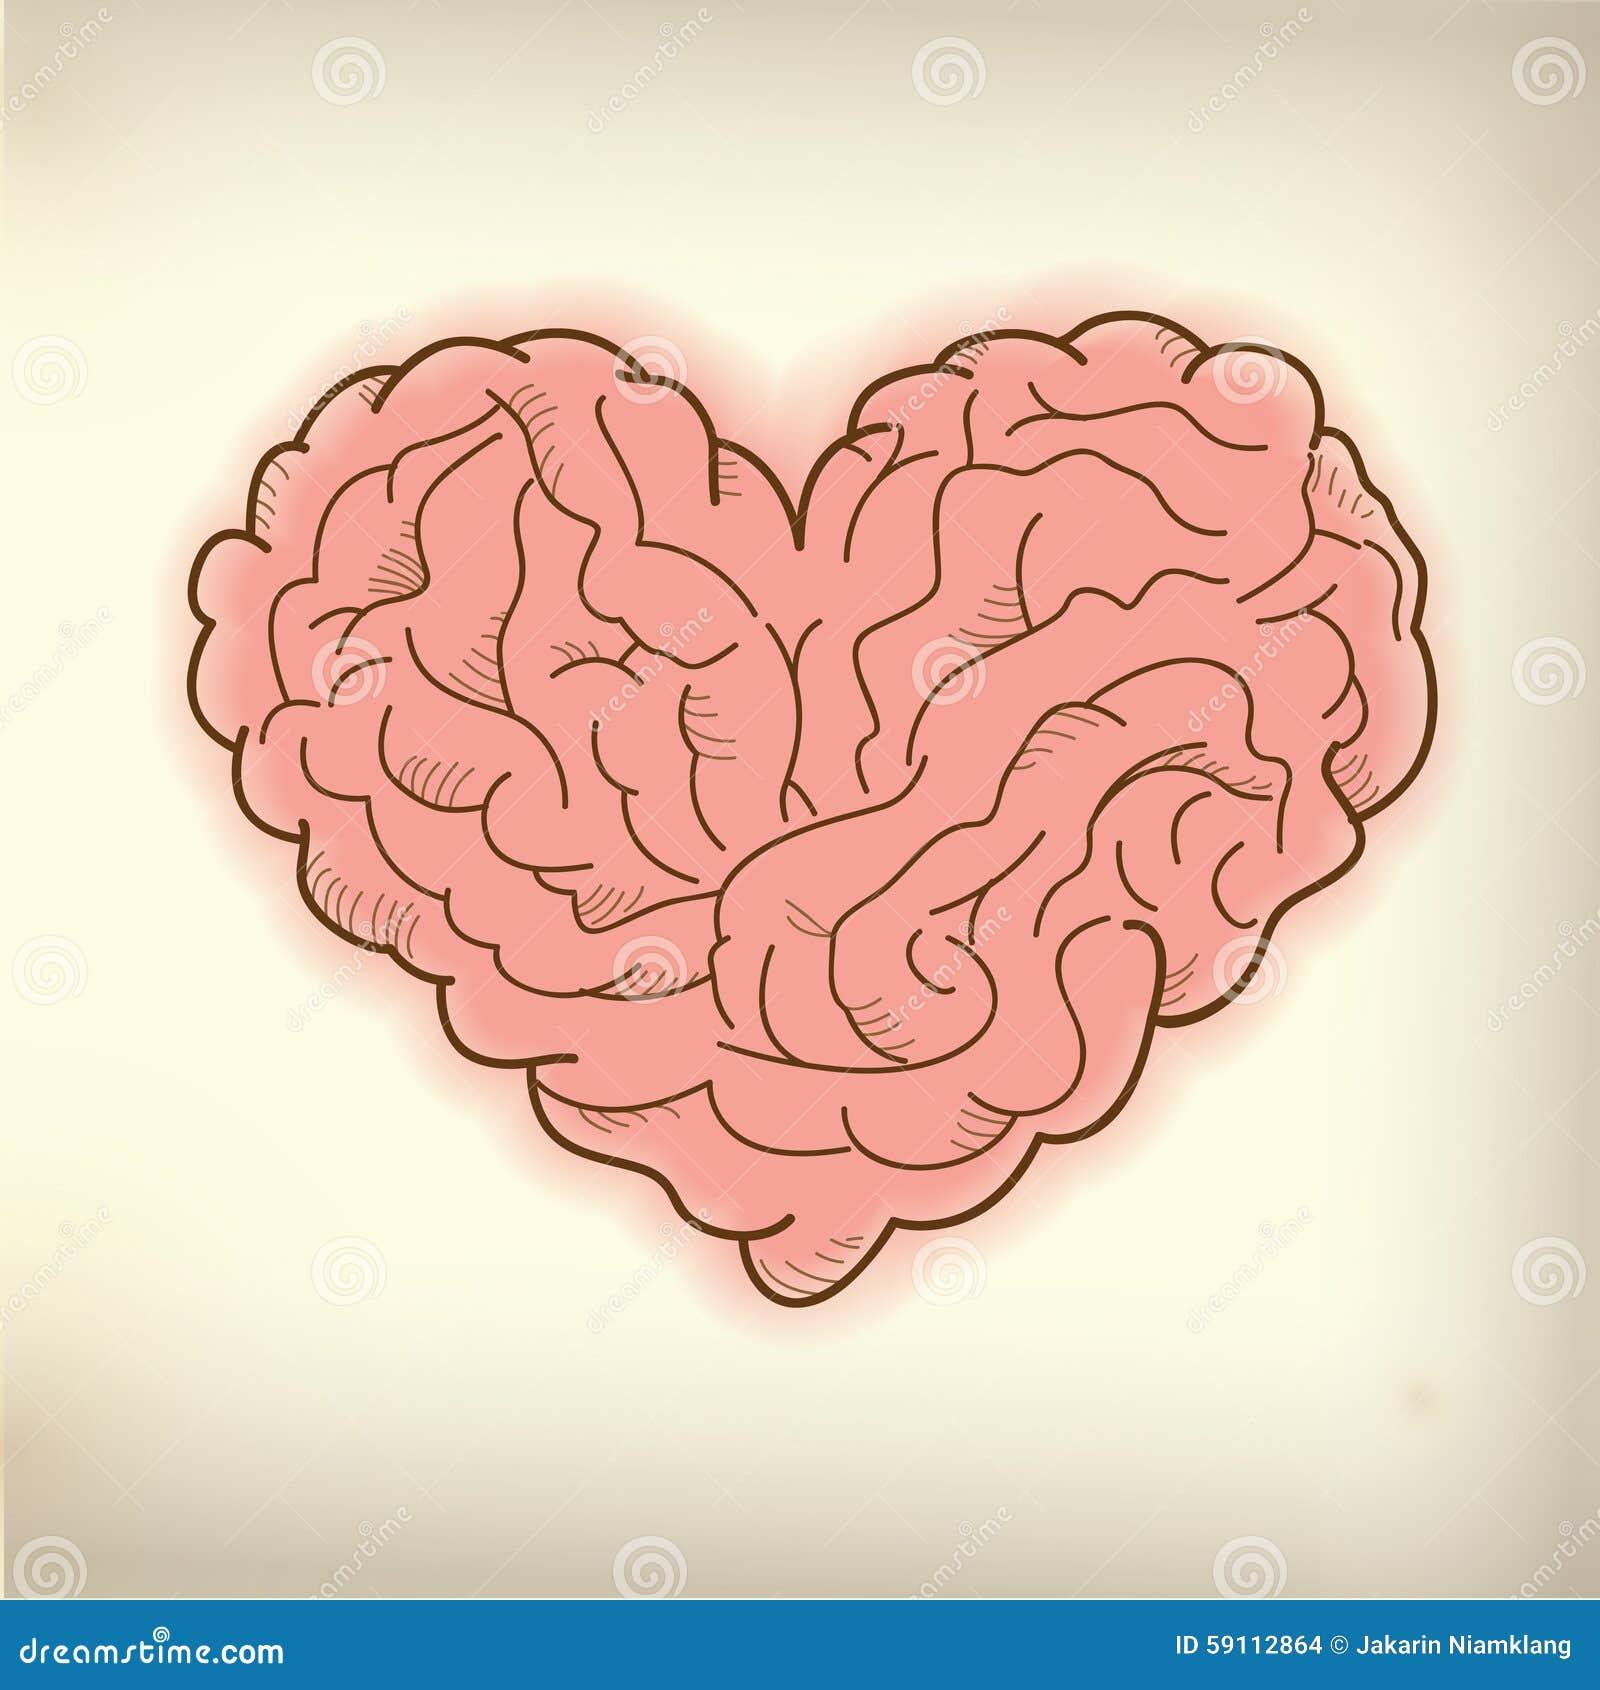 brain heart stock vector image 59112864 baba black sheep clipart black sheep clip art baby